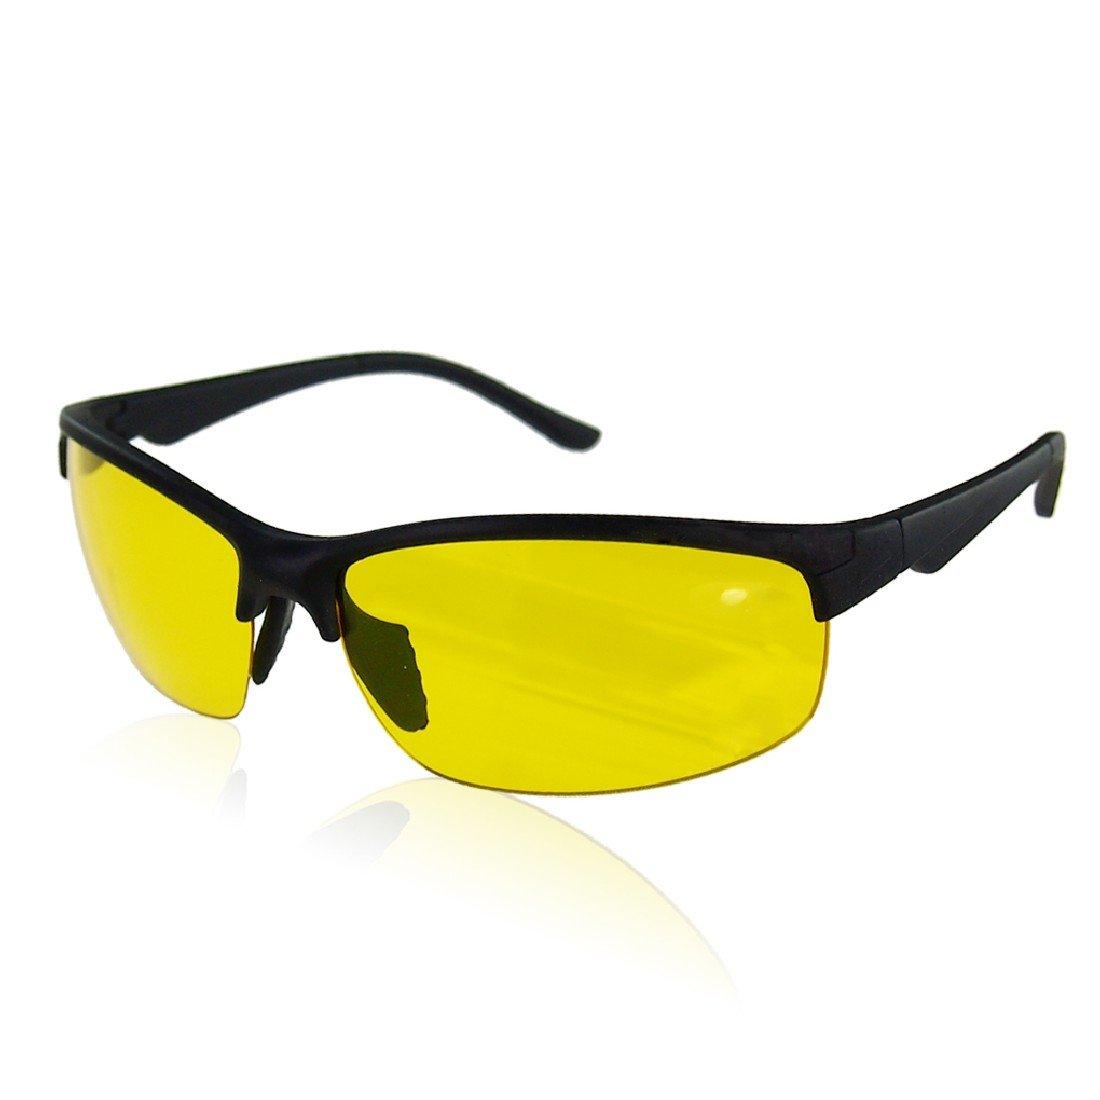 de64d6972a81 High Definition Night Vision Glasses Driving Sunglasses Yellow Lens Classic  UV400 Unisex Fishing Eyewear